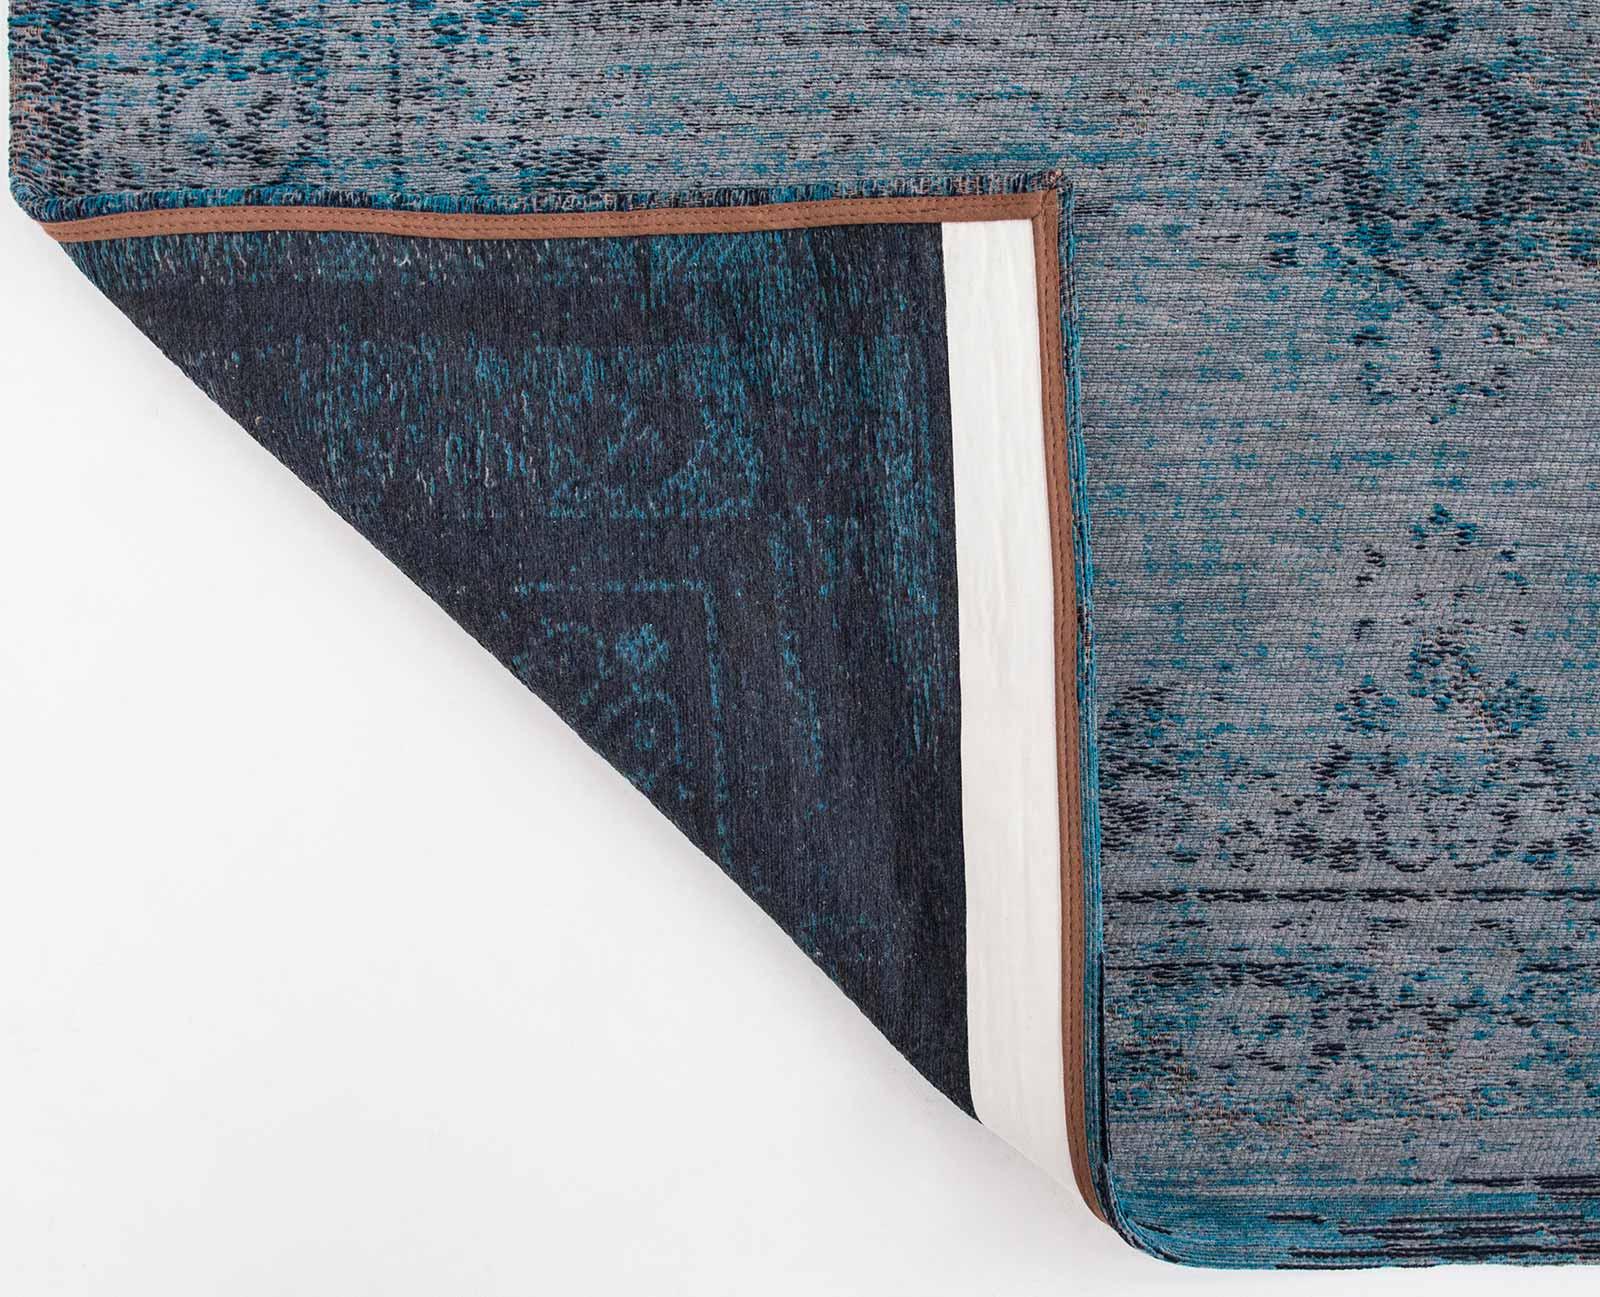 Louis de poortere tapis fading world grey turquoise 8255 medallion design for Moquette louis depoortere